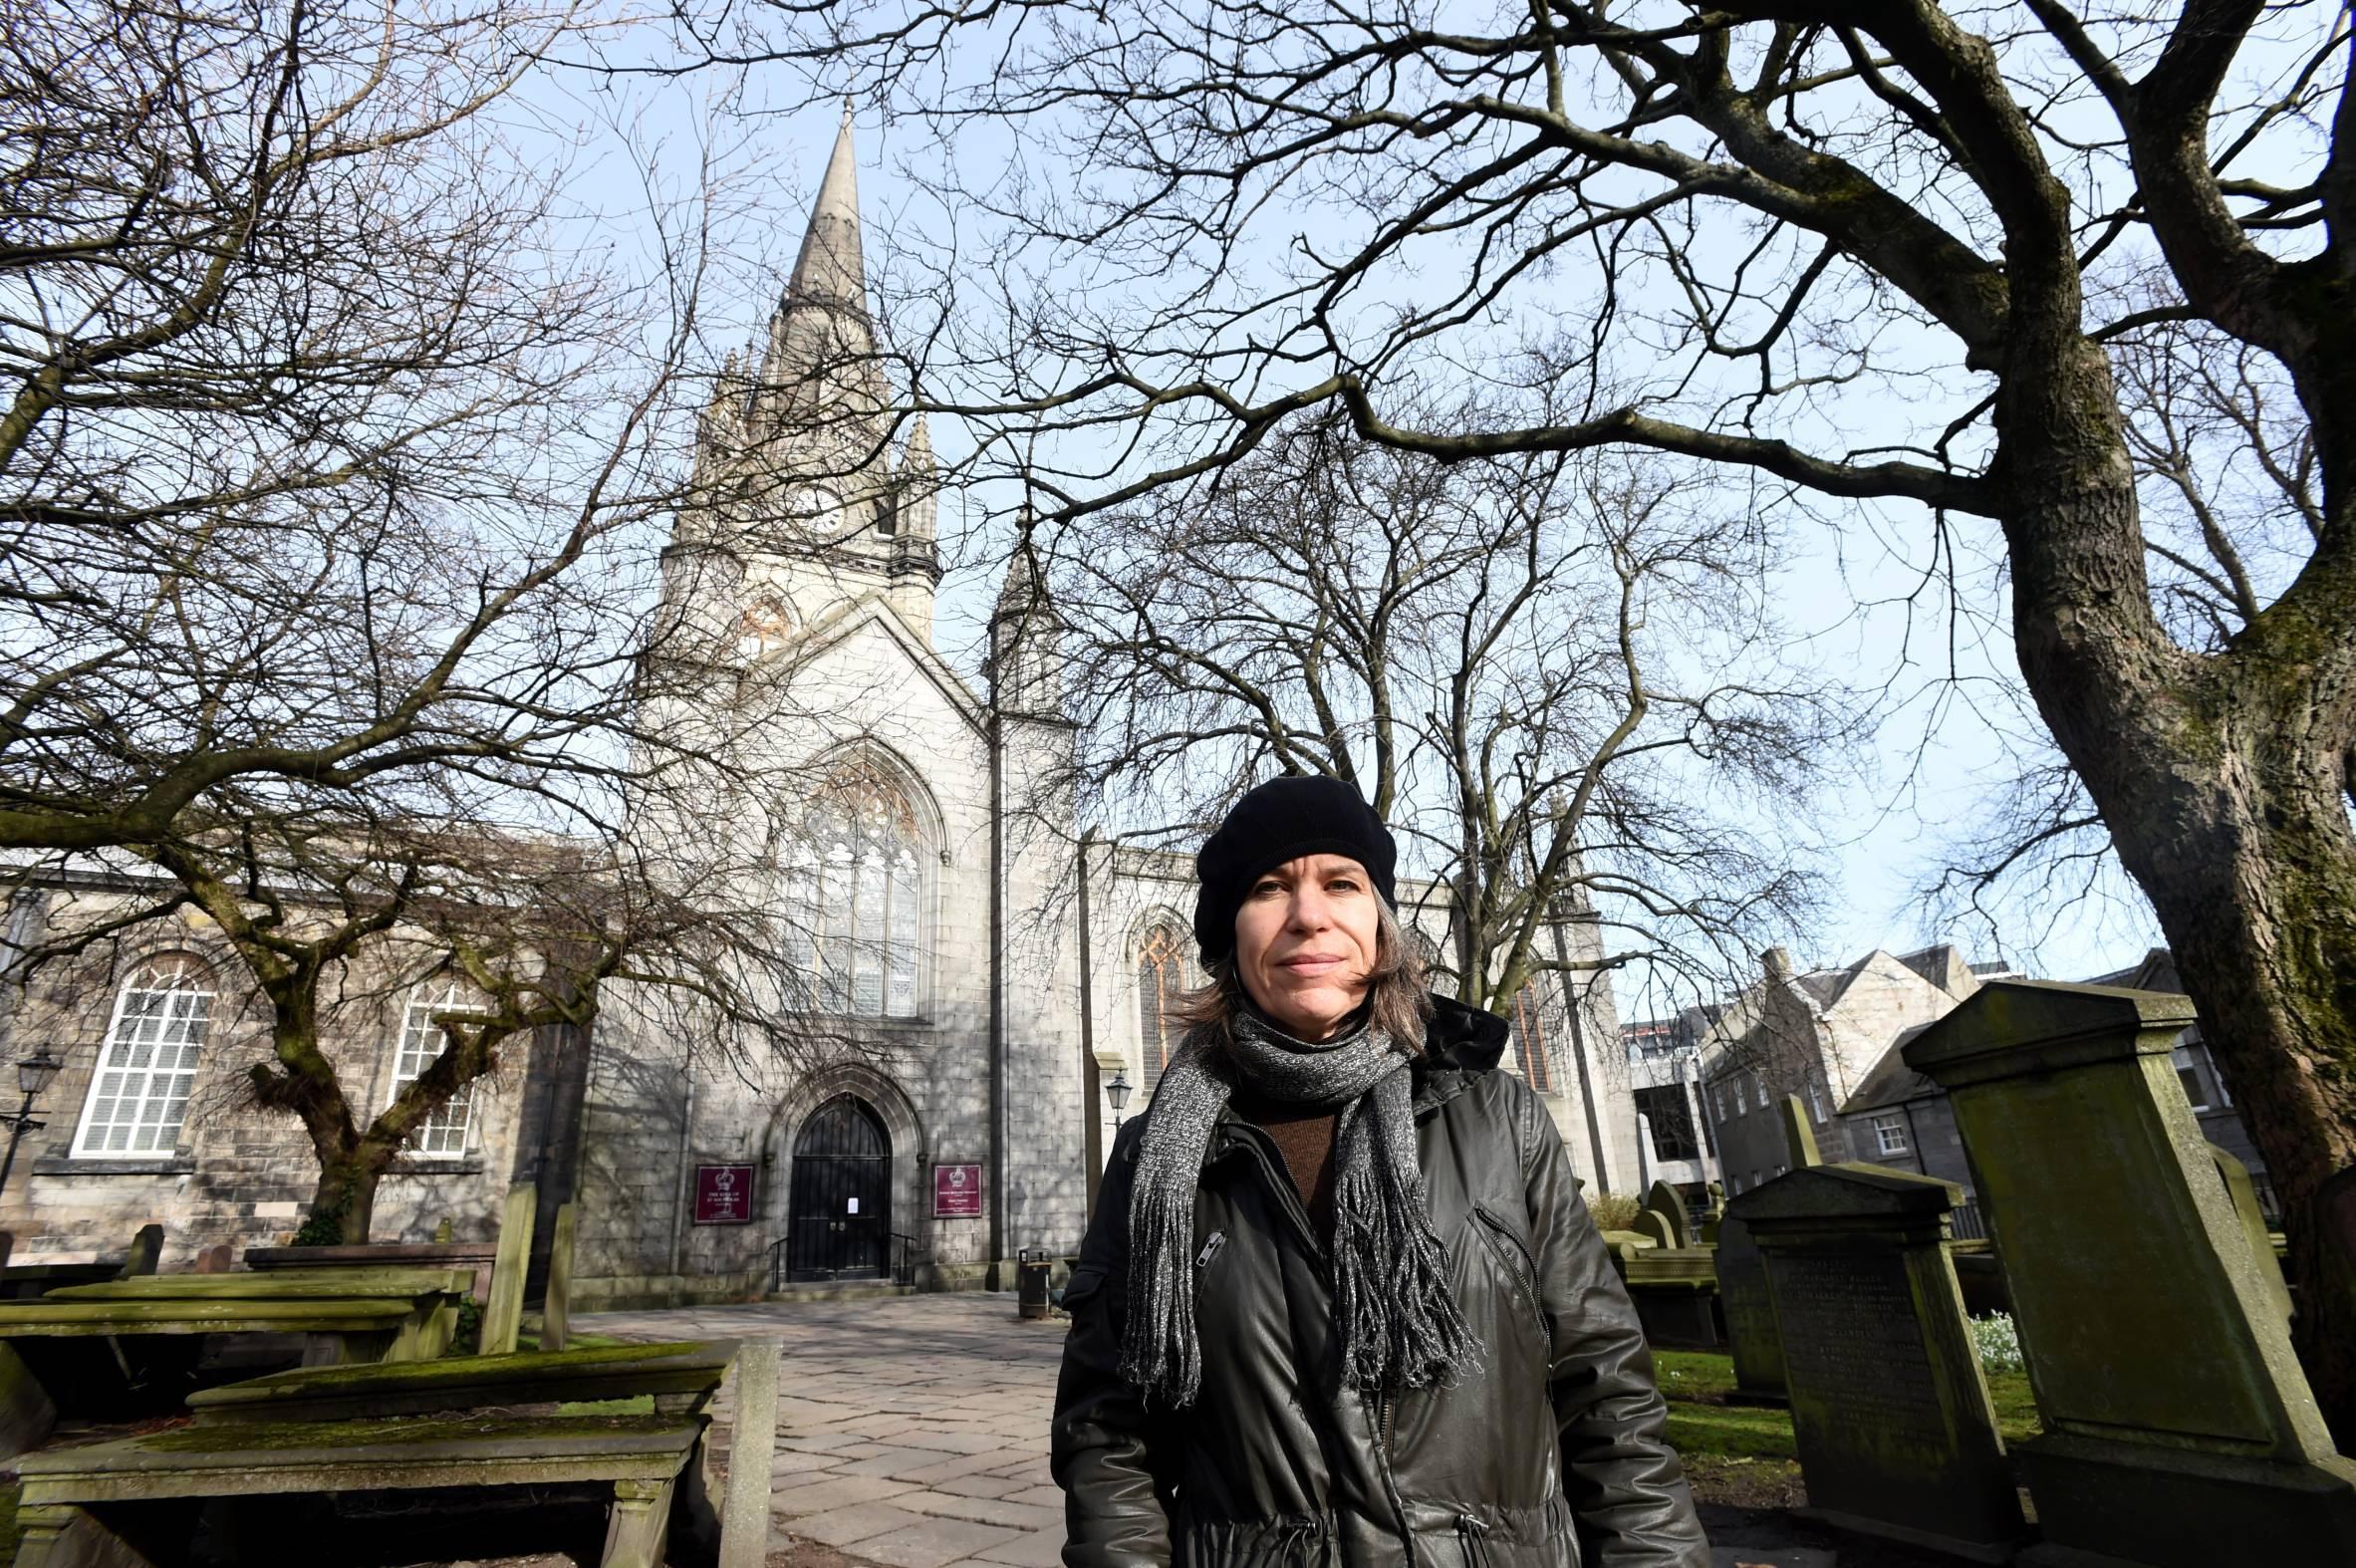 Janet McEwan at St Nicholas Kirk ahead of the festival.